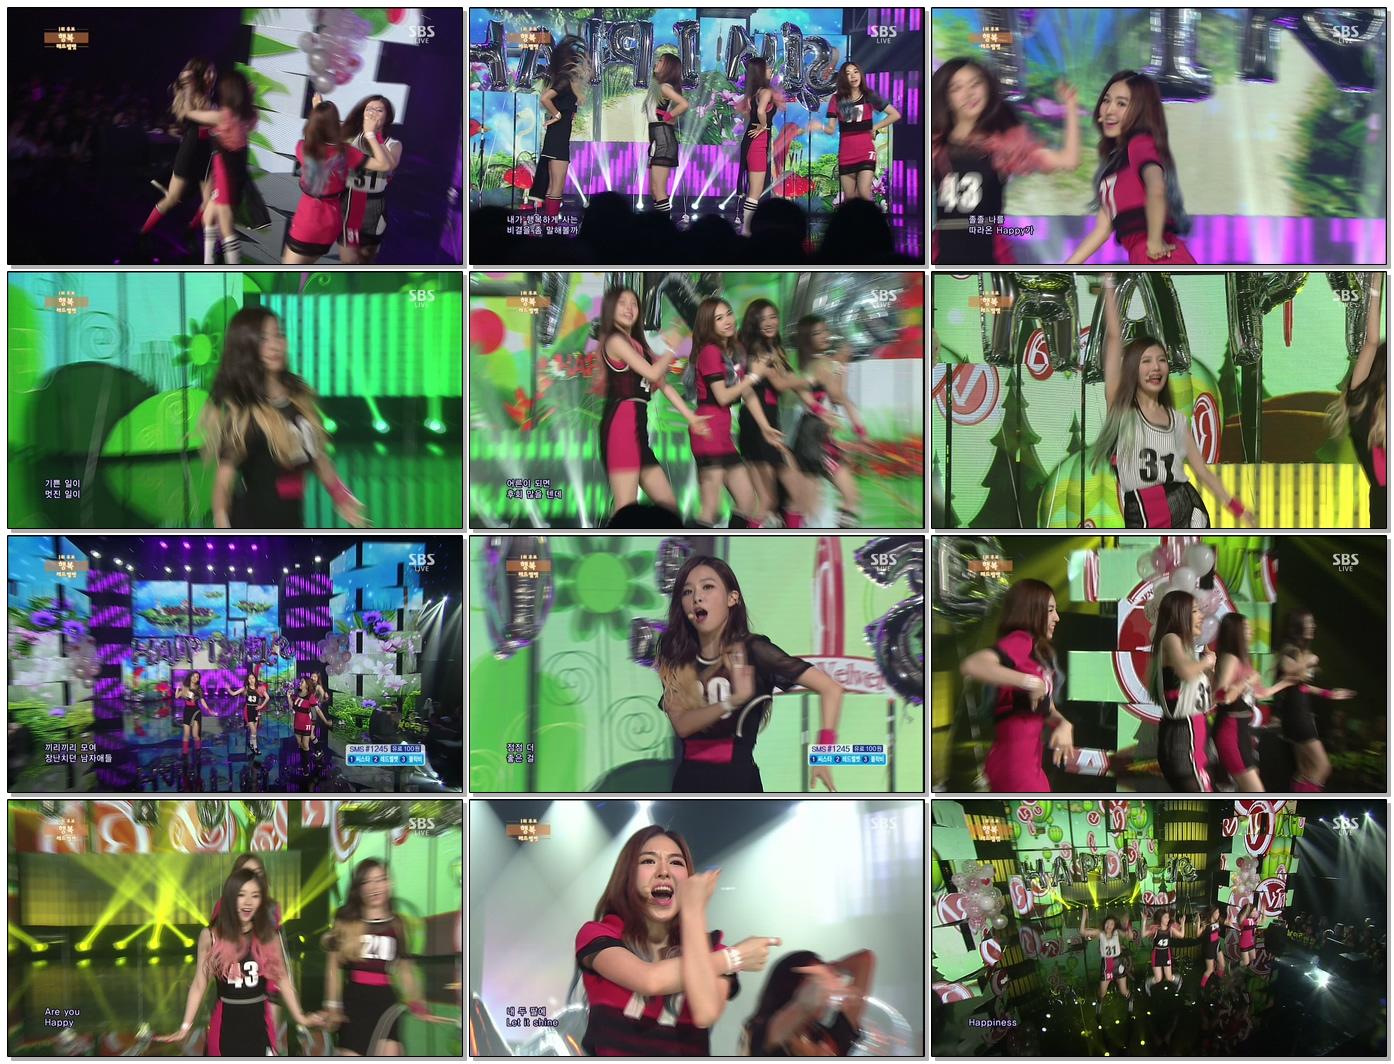 20170911.0938.15 Red Velvet - Happiness (Inkigayo 2014.08.17 HDTV) (JPOP.ru).ts.jpg